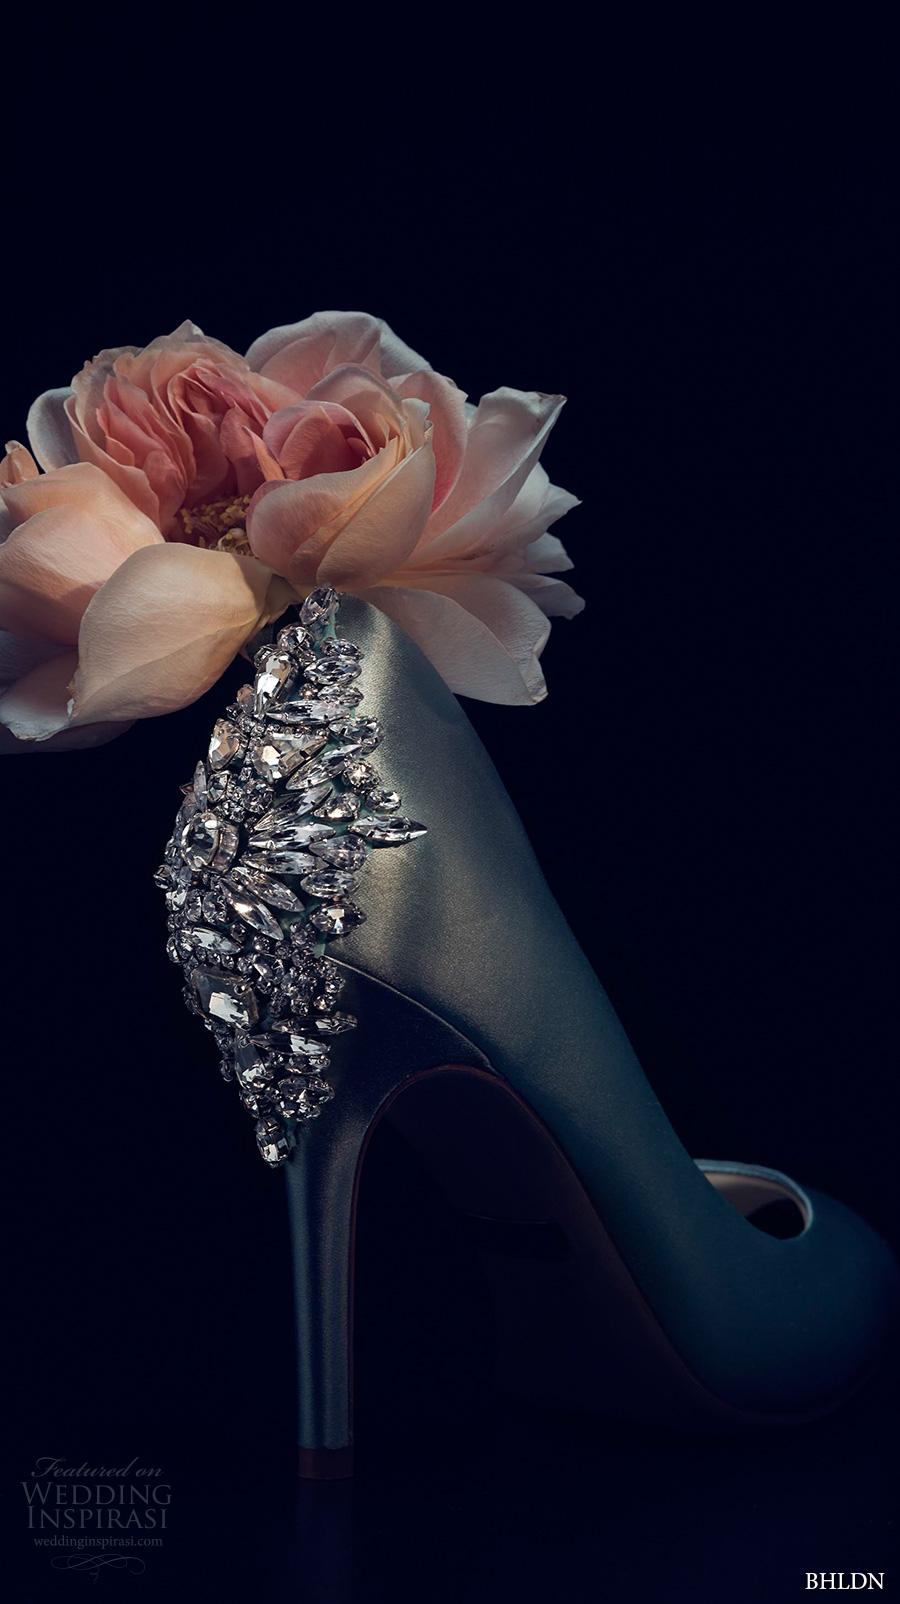 bhldn spring 2017 bridal wedding acessories green color peep toe high heels weding shoes (bella crystal)